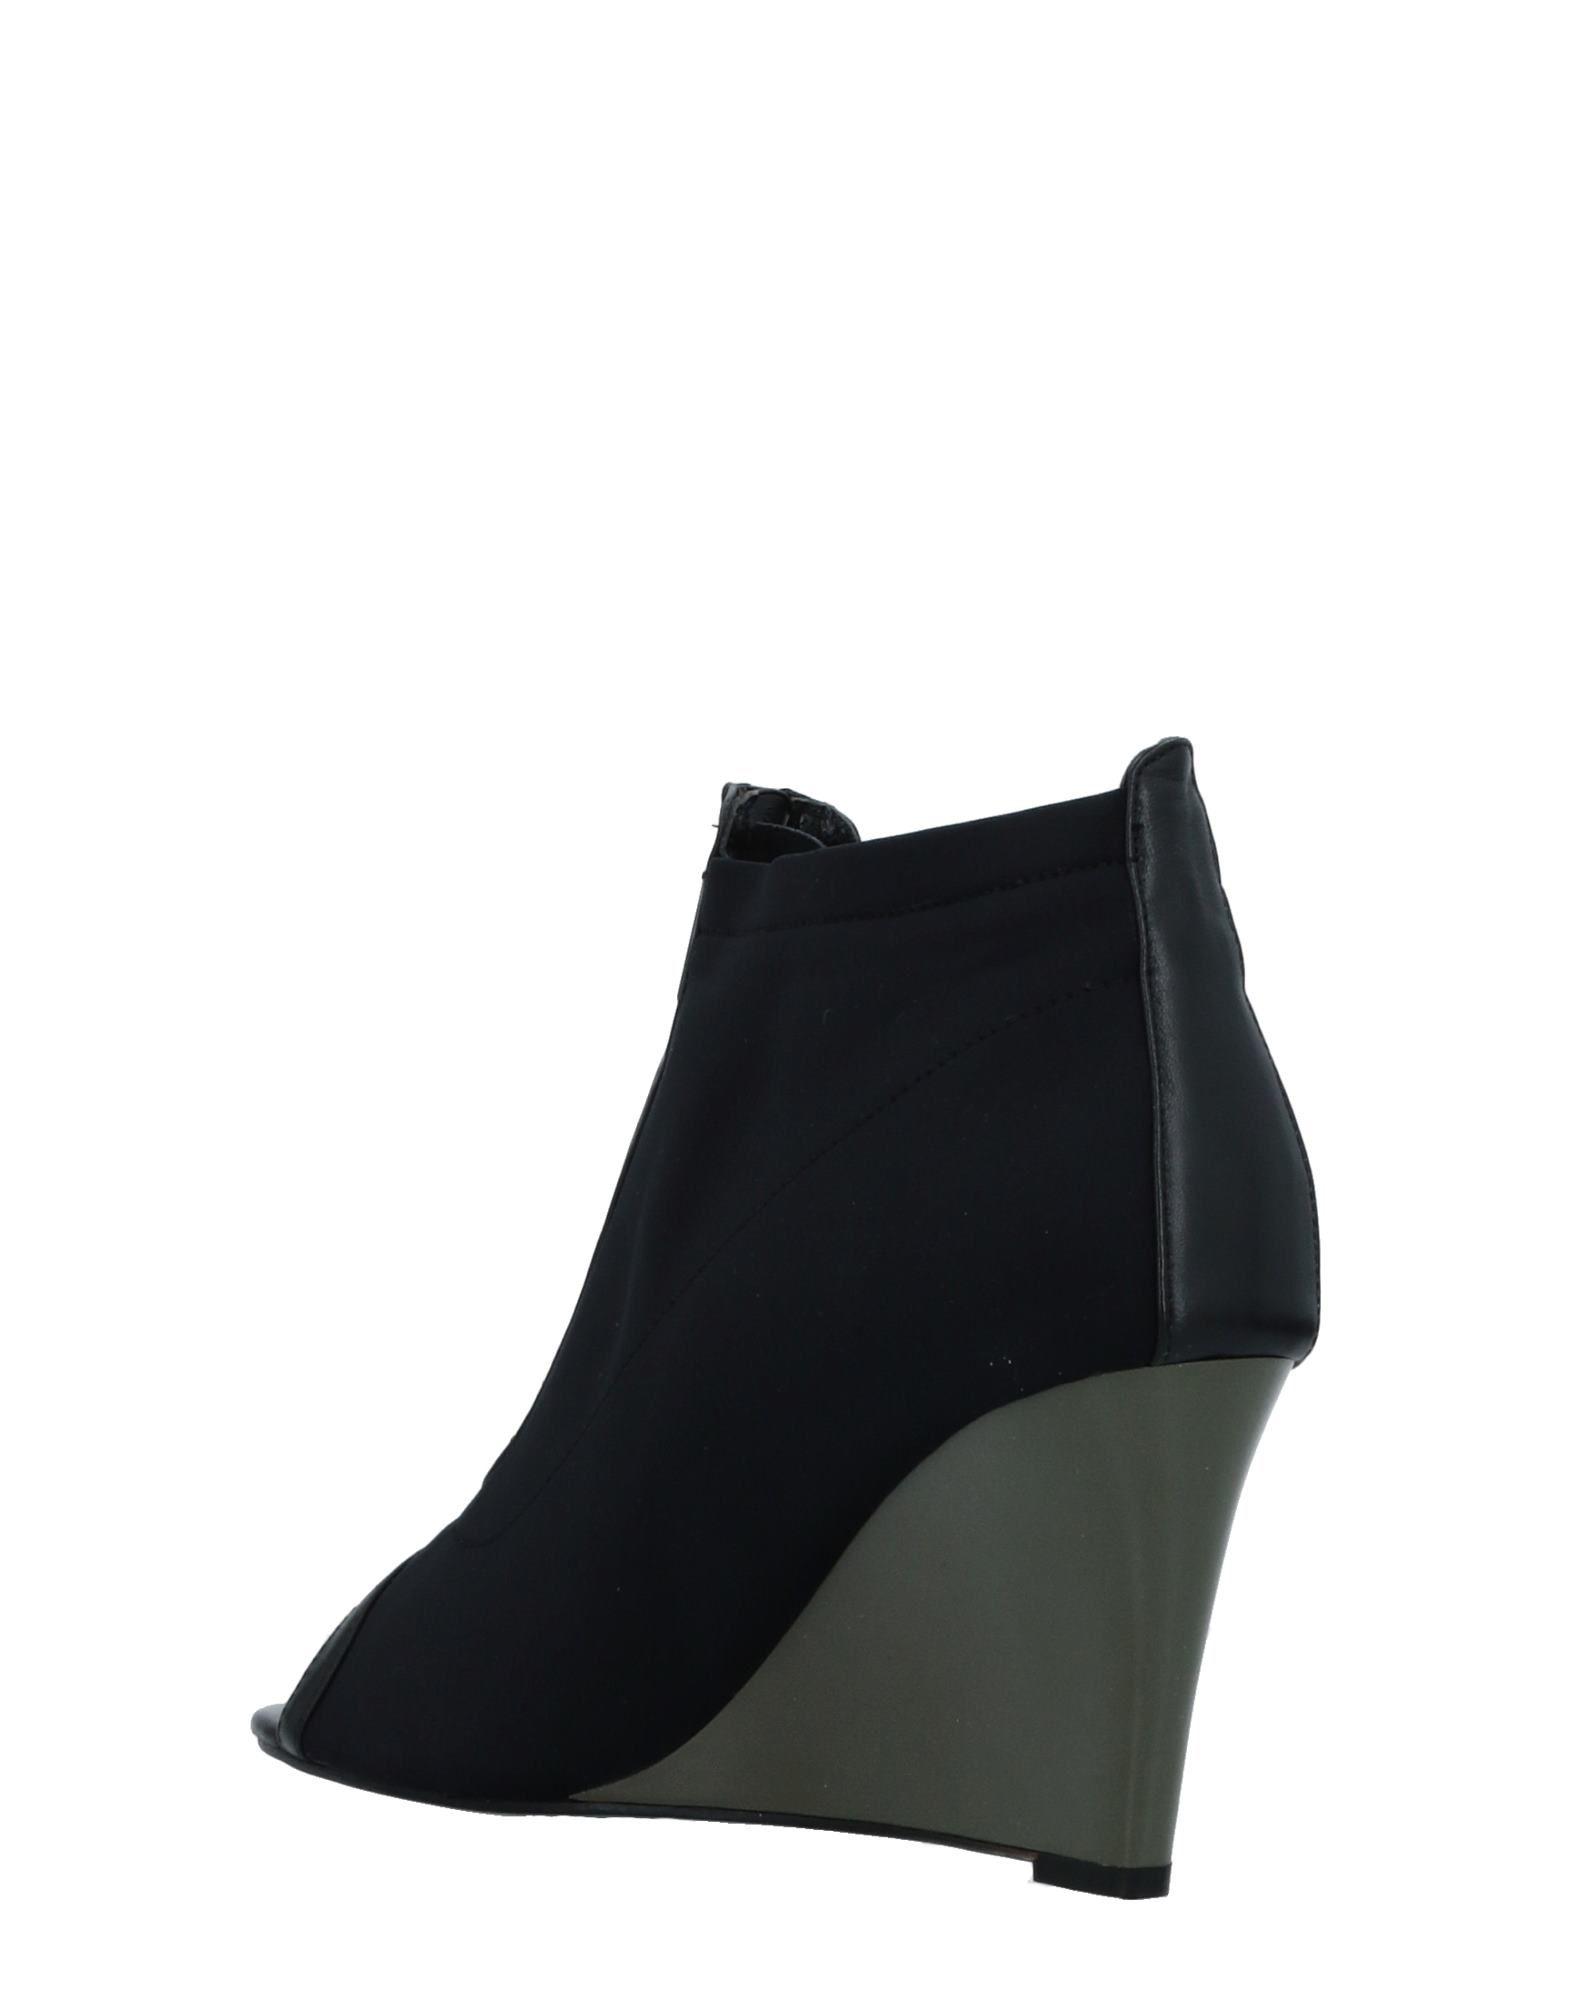 Mi/Mai Stiefelette Damen Gute  11517771MM Gute Damen Qualität beliebte Schuhe ae5de7